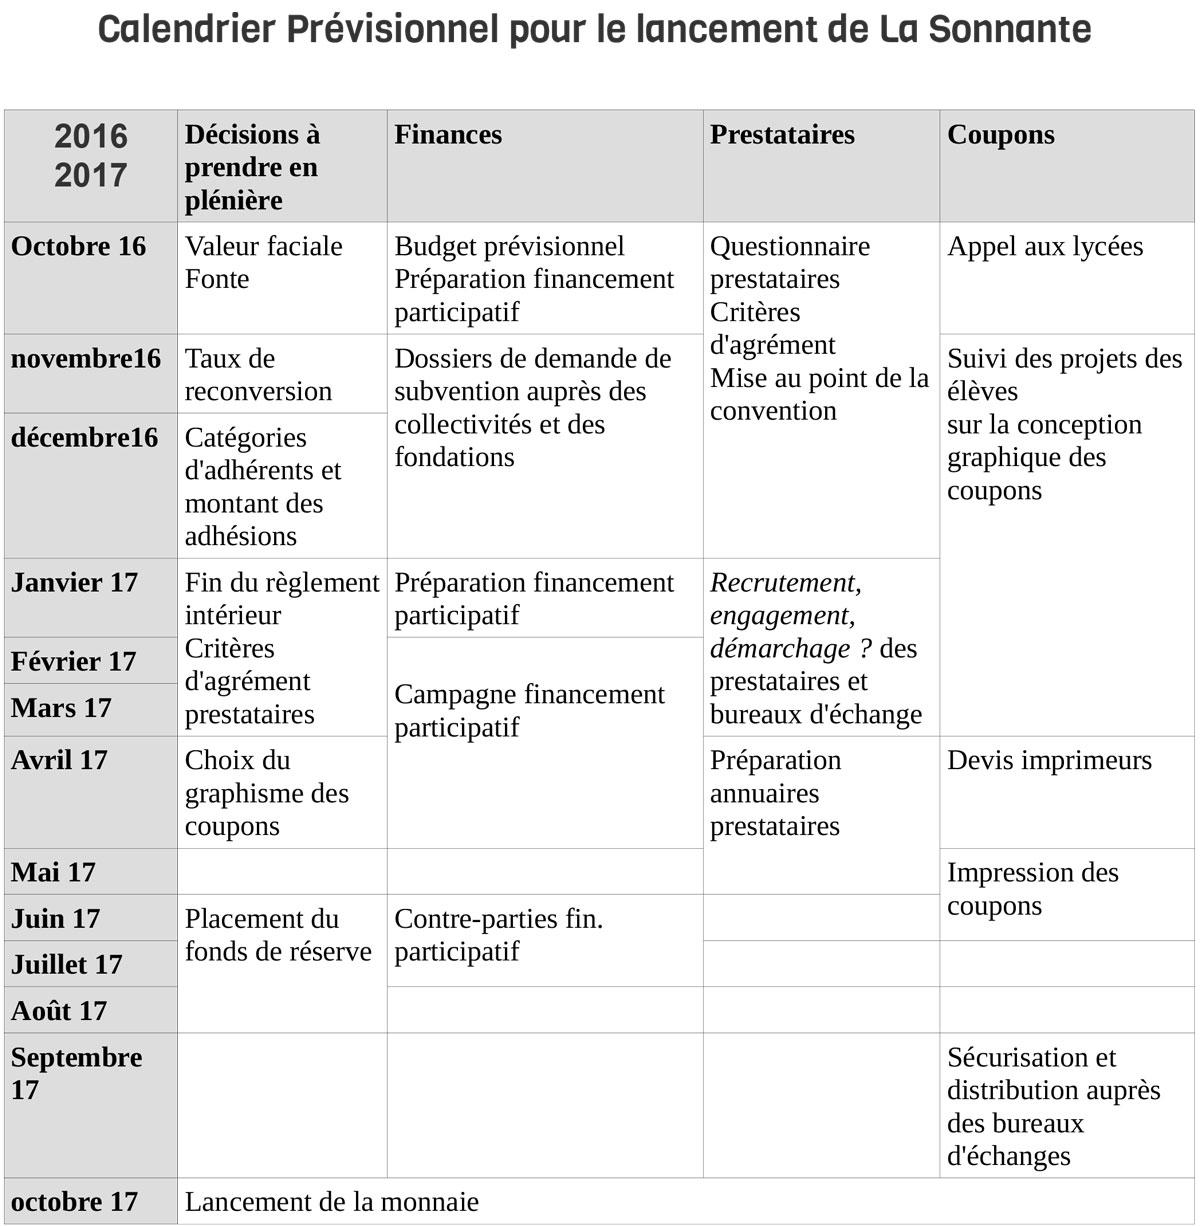 calendier previsionnel 2016-2017